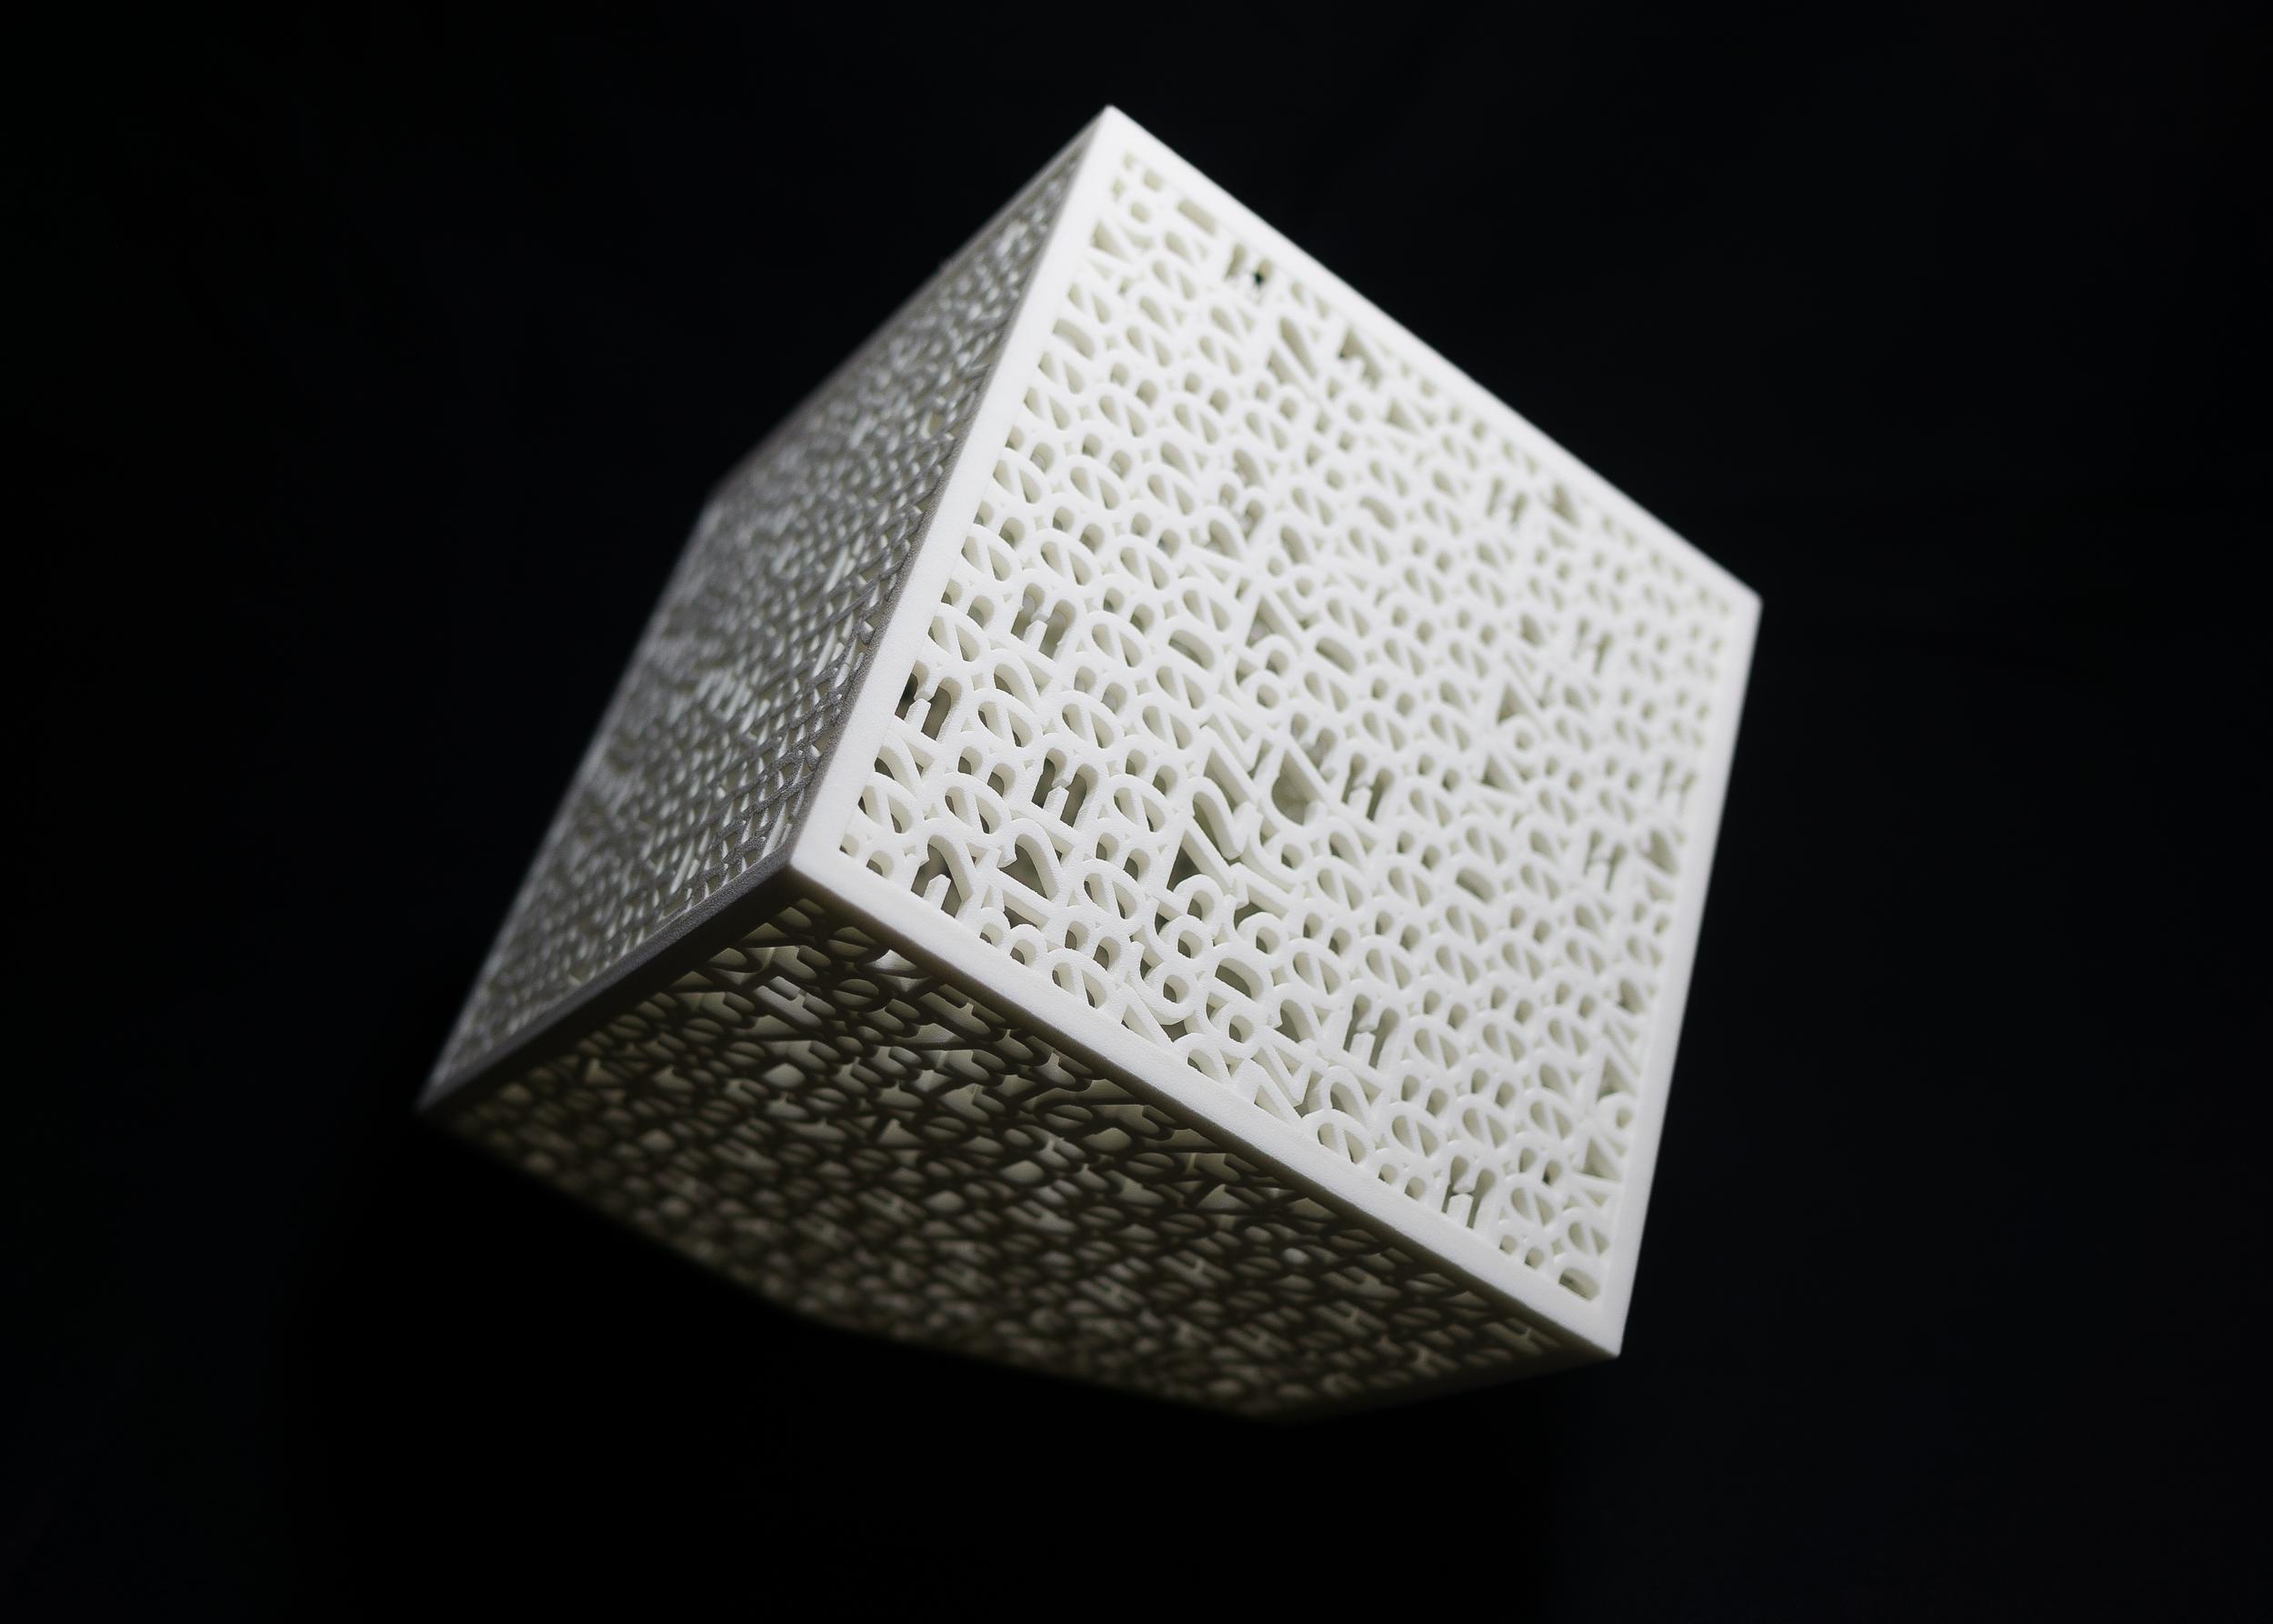 hexahedron[7_].jpg